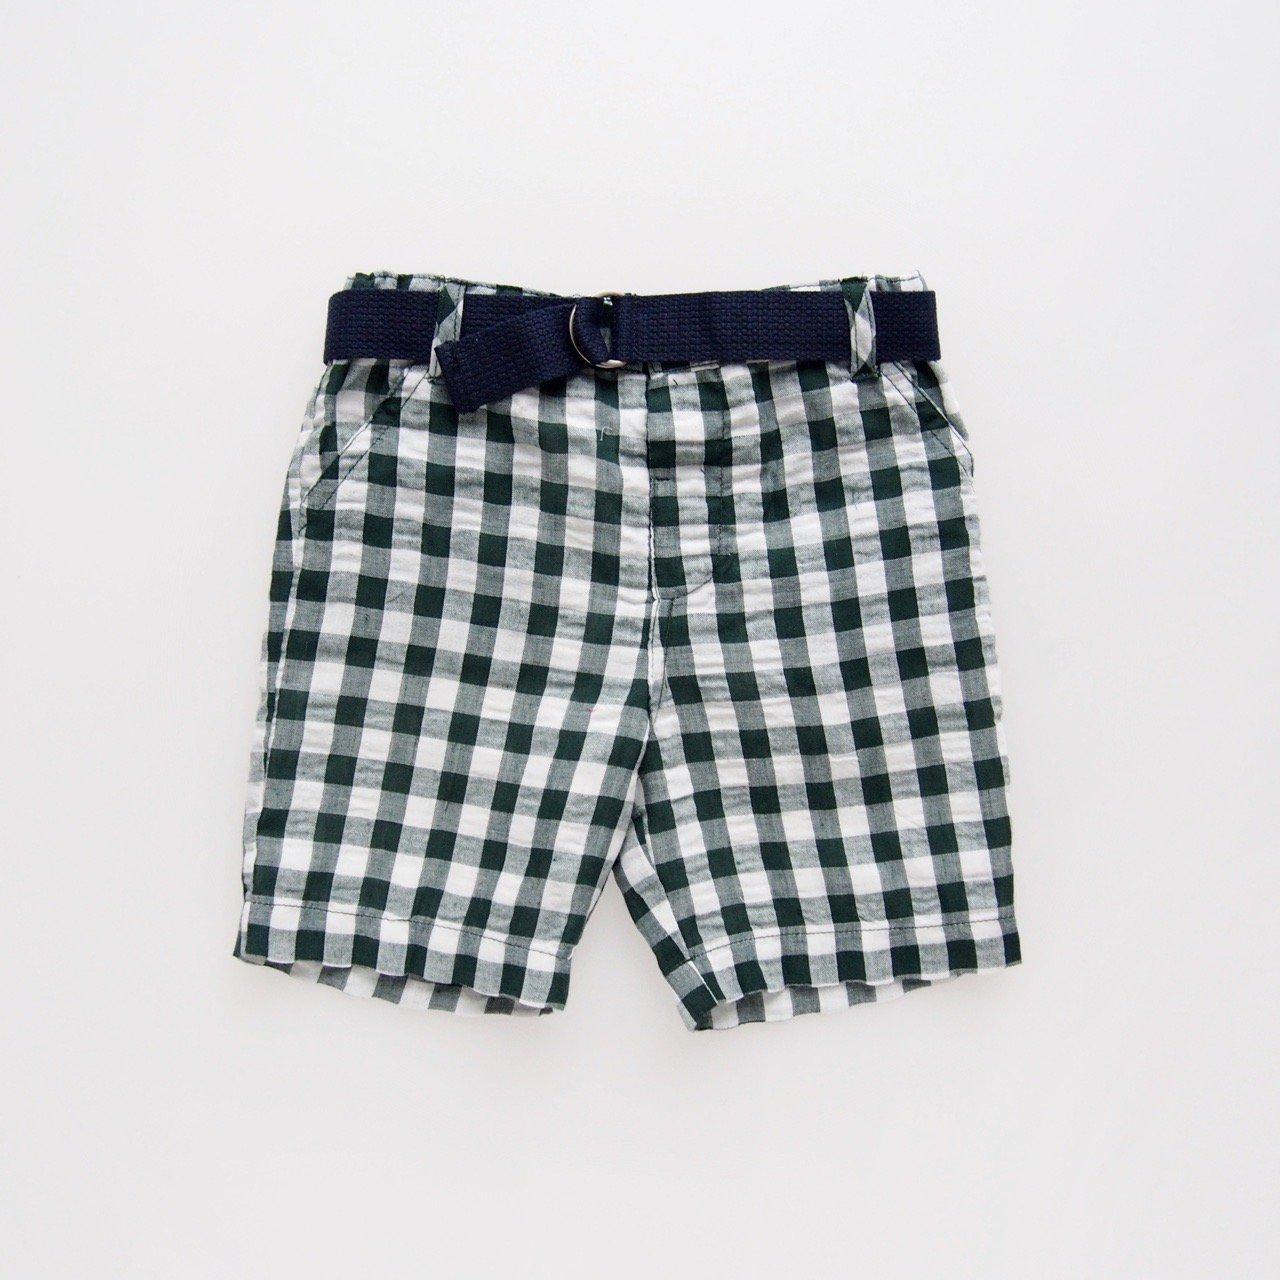 <img class='new_mark_img1' src='https://img.shop-pro.jp/img/new/icons14.gif' style='border:none;display:inline;margin:0px;padding:0px;width:auto;' />Malvi&Co. - Seersucker gingham shorts (Green/ Navy)